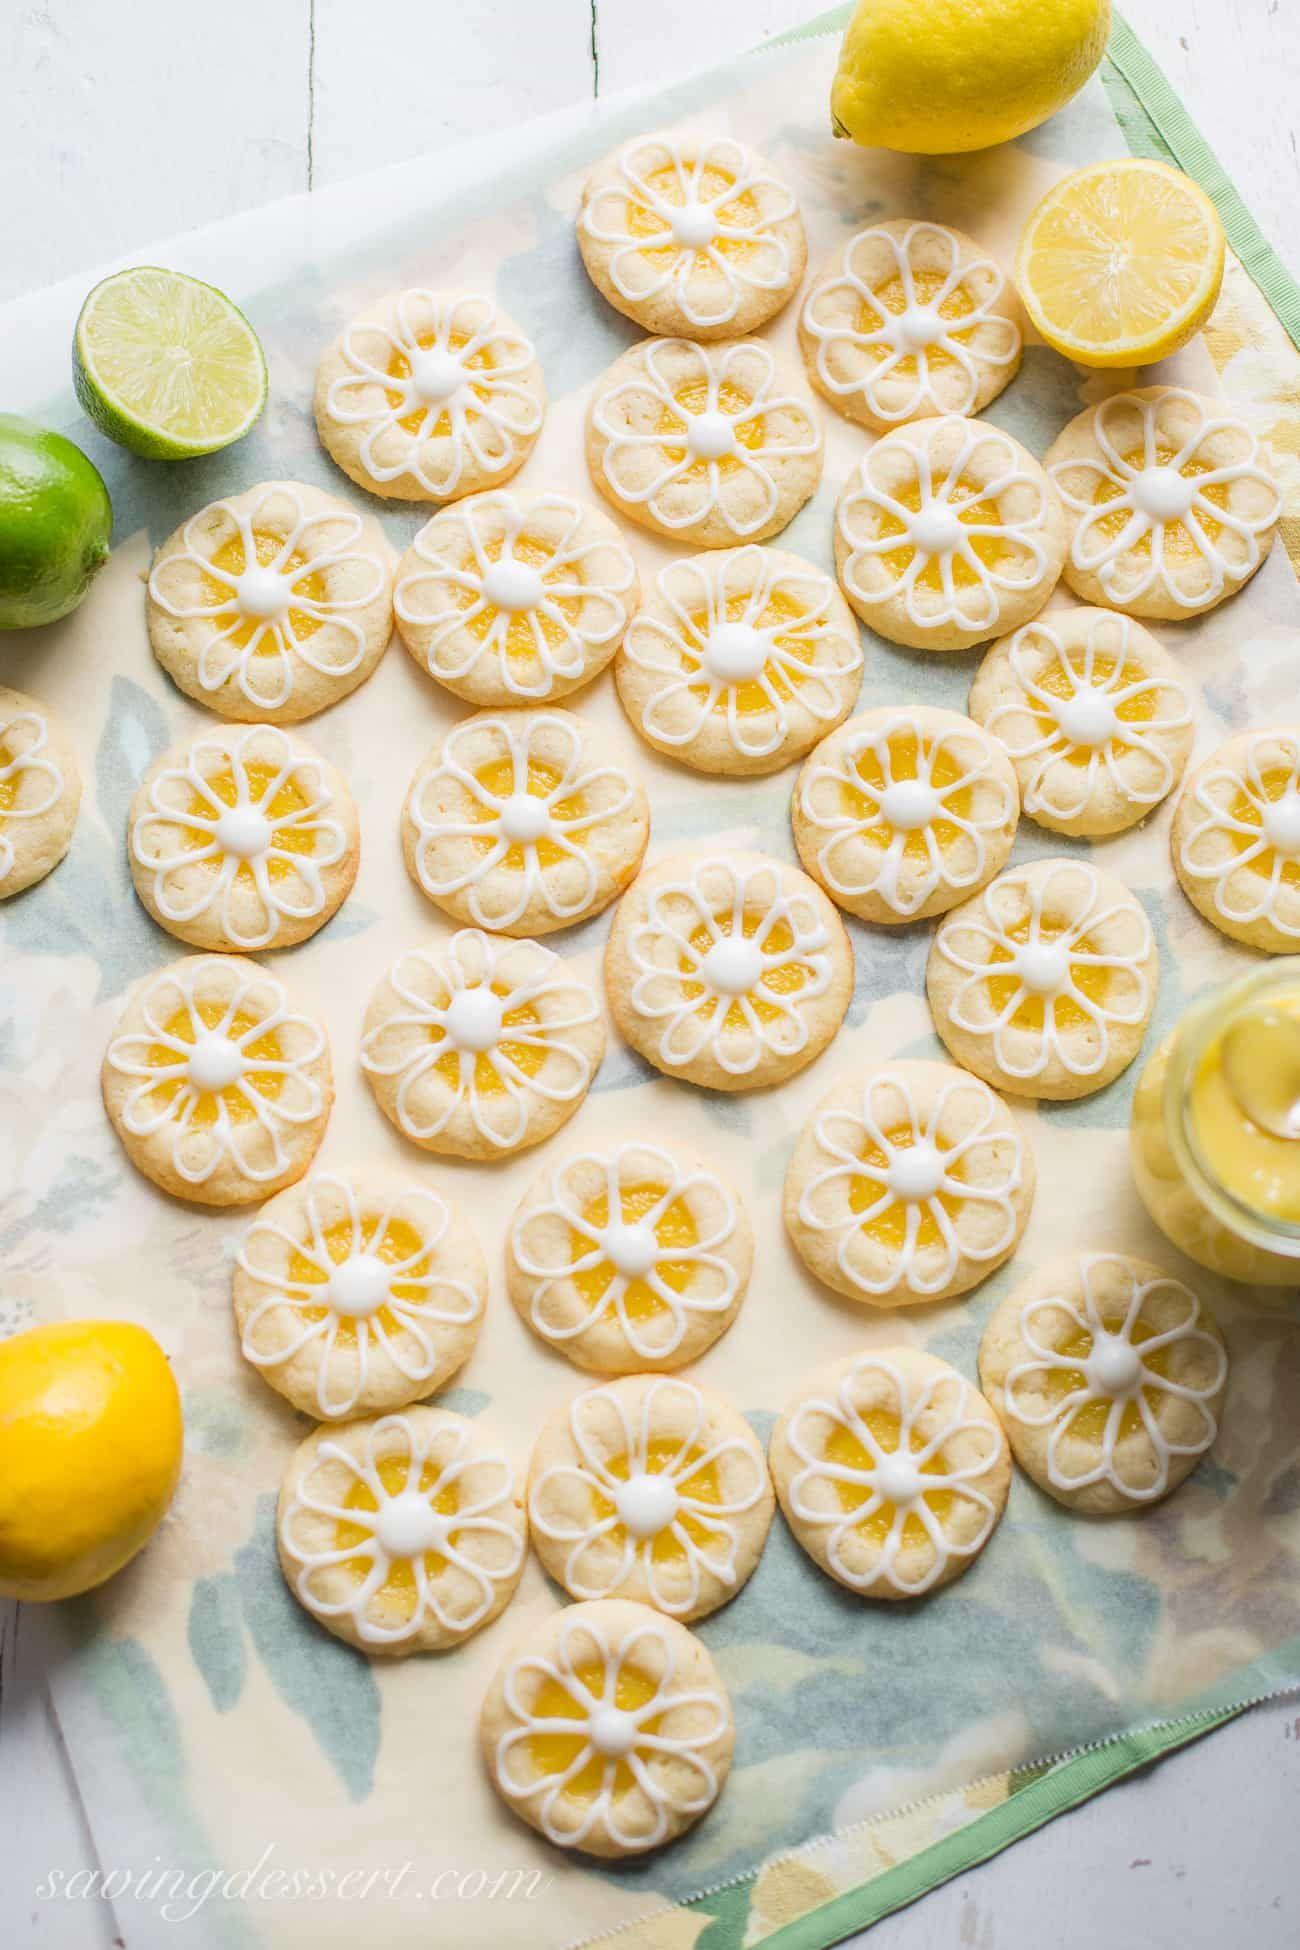 Forum on this topic: Lemon-Lime Shortbread, lemon-lime-shortbread/